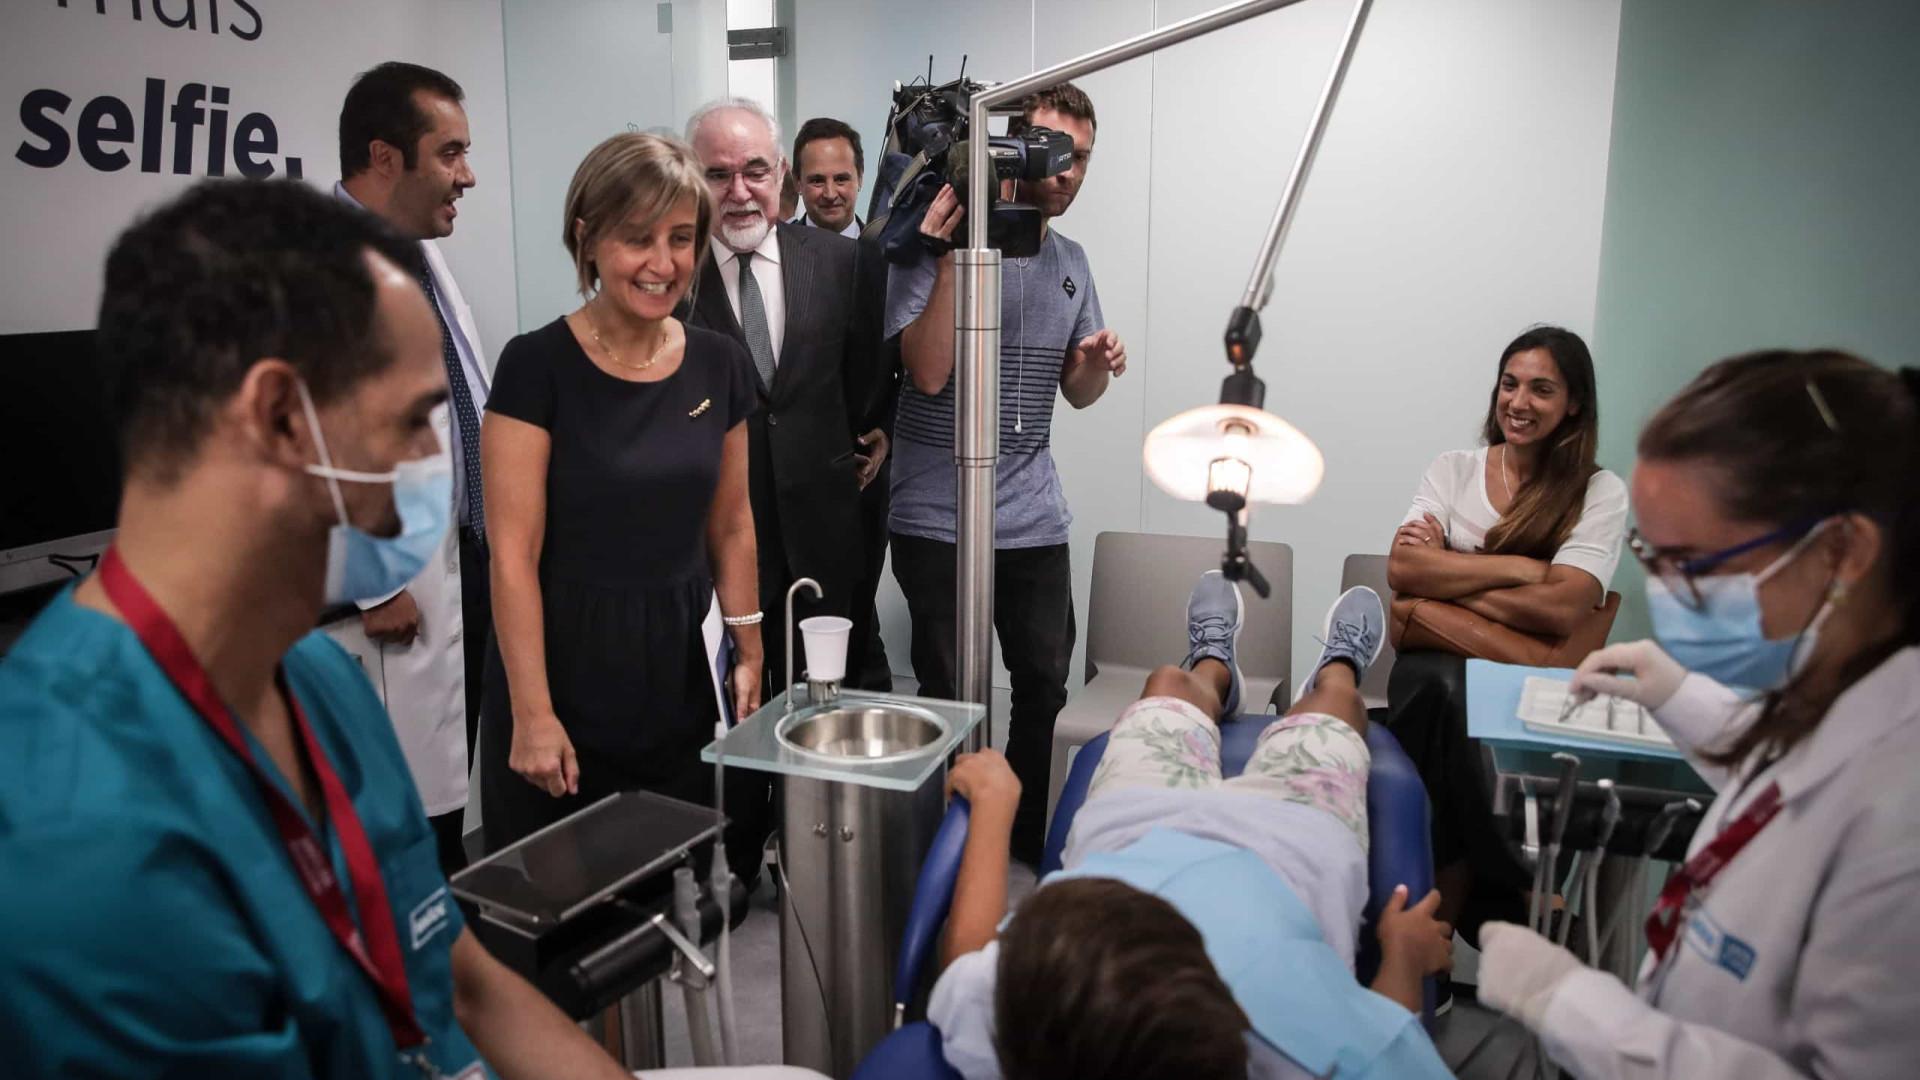 Lisboa passa a ter clínica de saúde oral gratuita para jovens até 18 anos